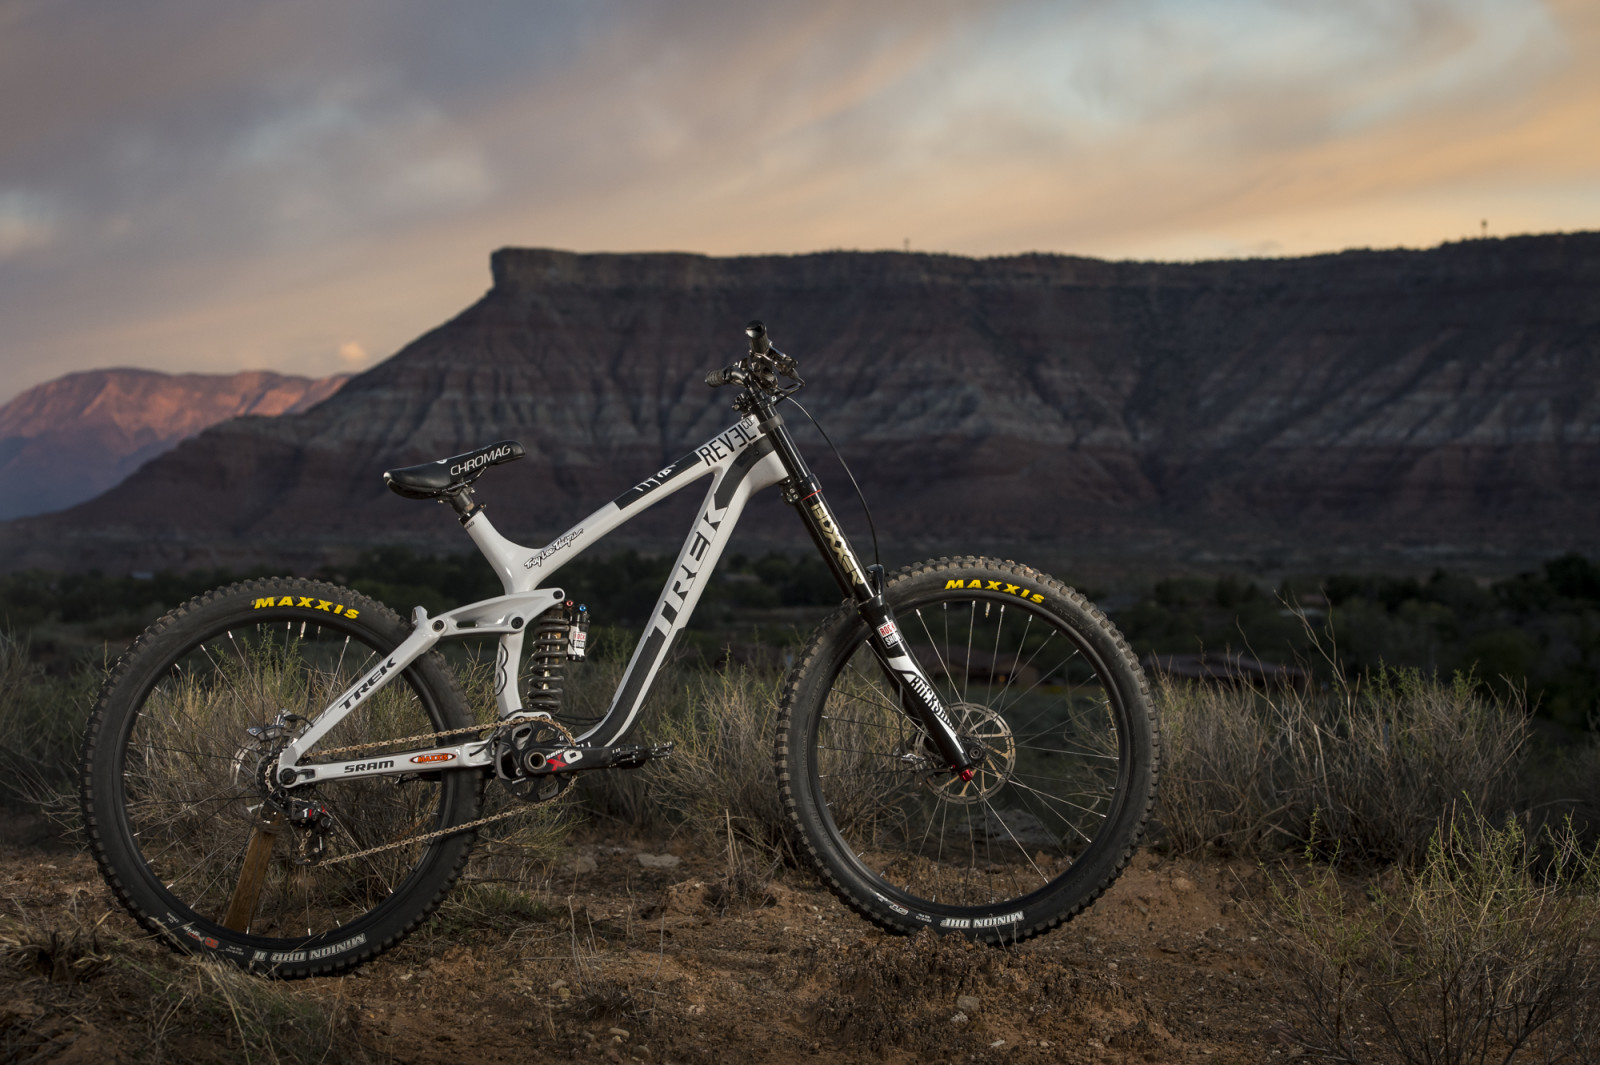 [Bike Check] Brandon Semenuk's Trek Session | MTB-MAG.COM